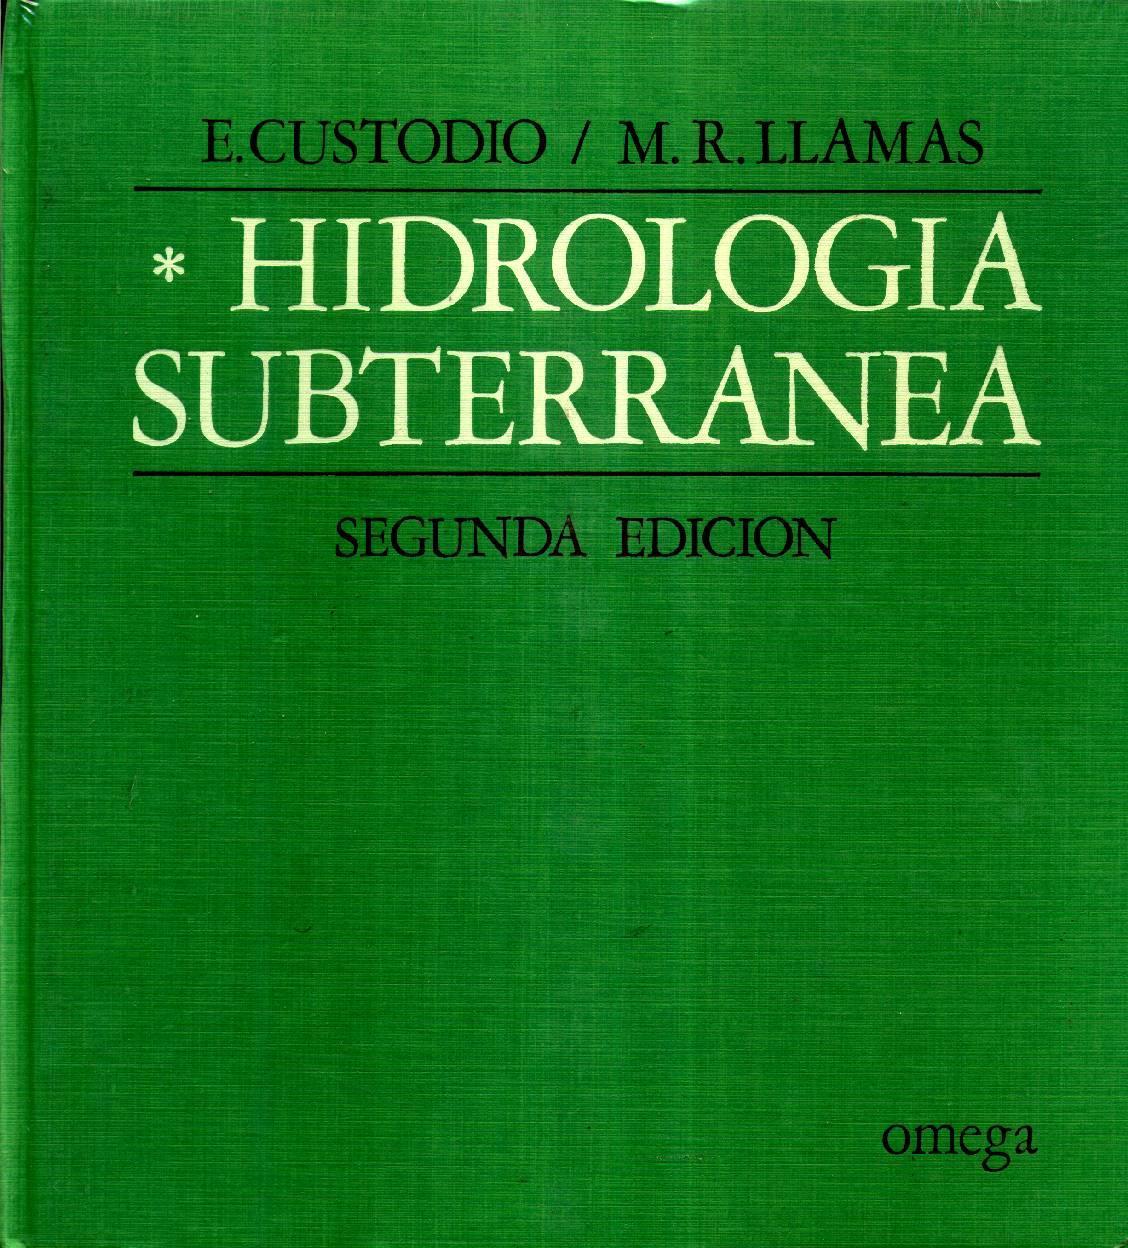 hidrologia subterranea custodio llamas pdf